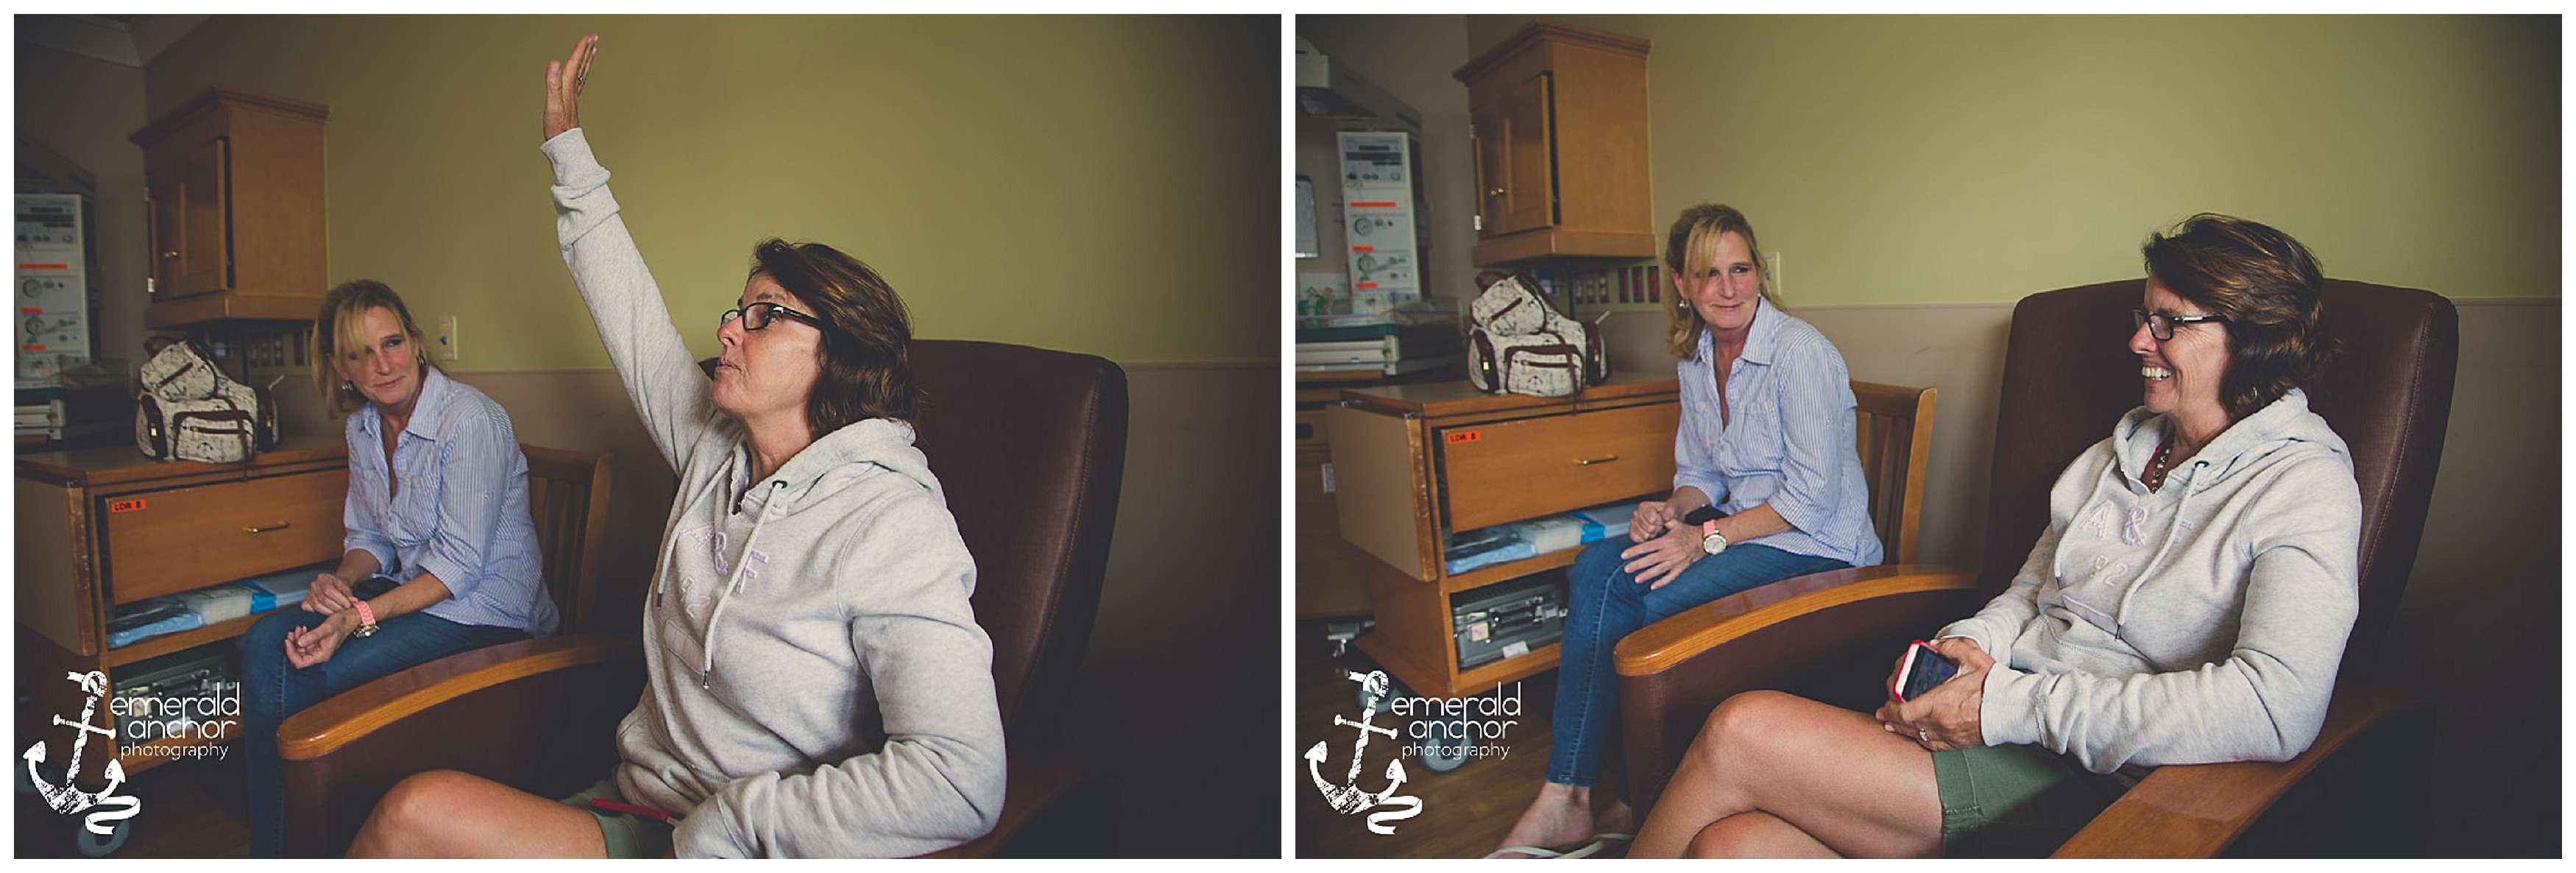 Emerald Anchor Photography Riverside Hospital Birth Story Photography Uriah Kade (26)